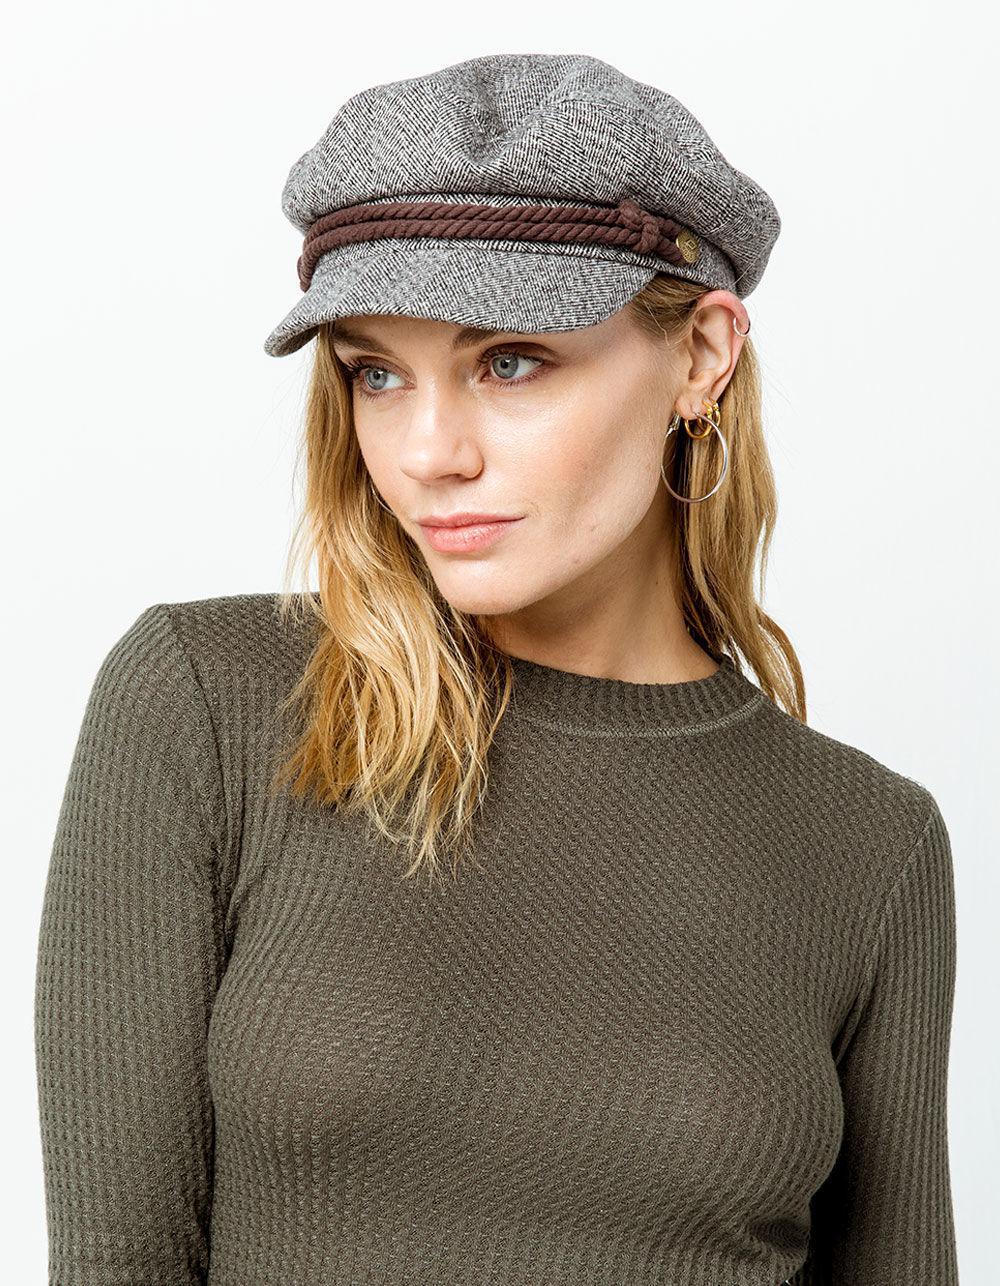 565a0e98b4413 Lyst - Brixton Heather Gray   Cream Womens Fiddler Cap in Gray